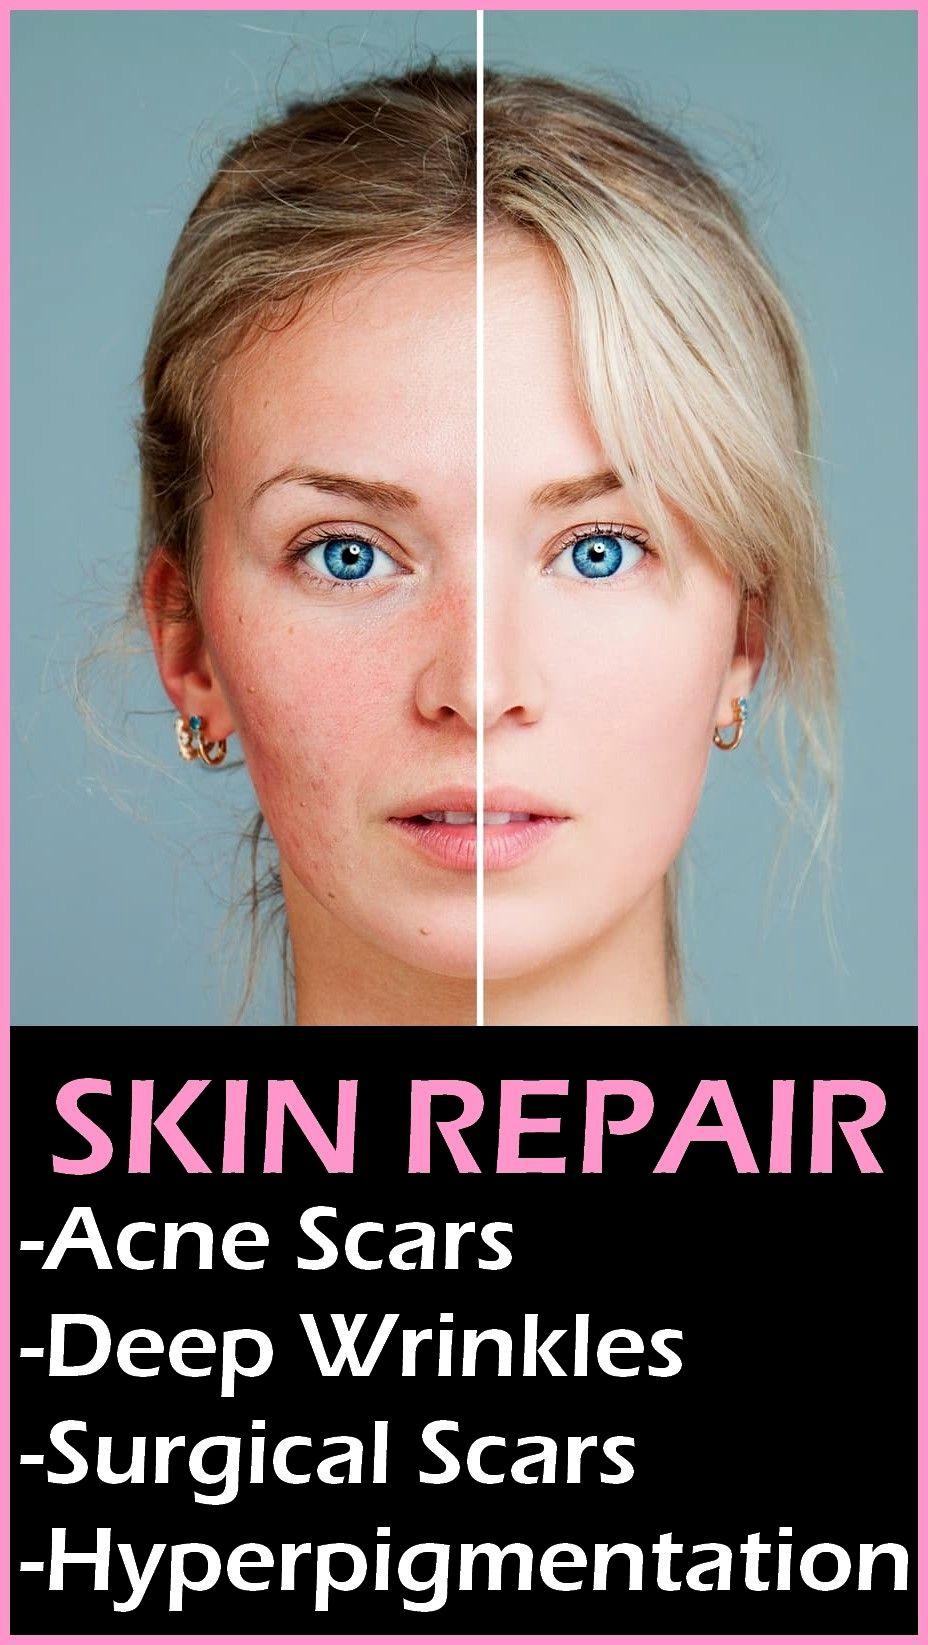 Pin by Elisha Moreno on beauty skin in 2020 Skin repair